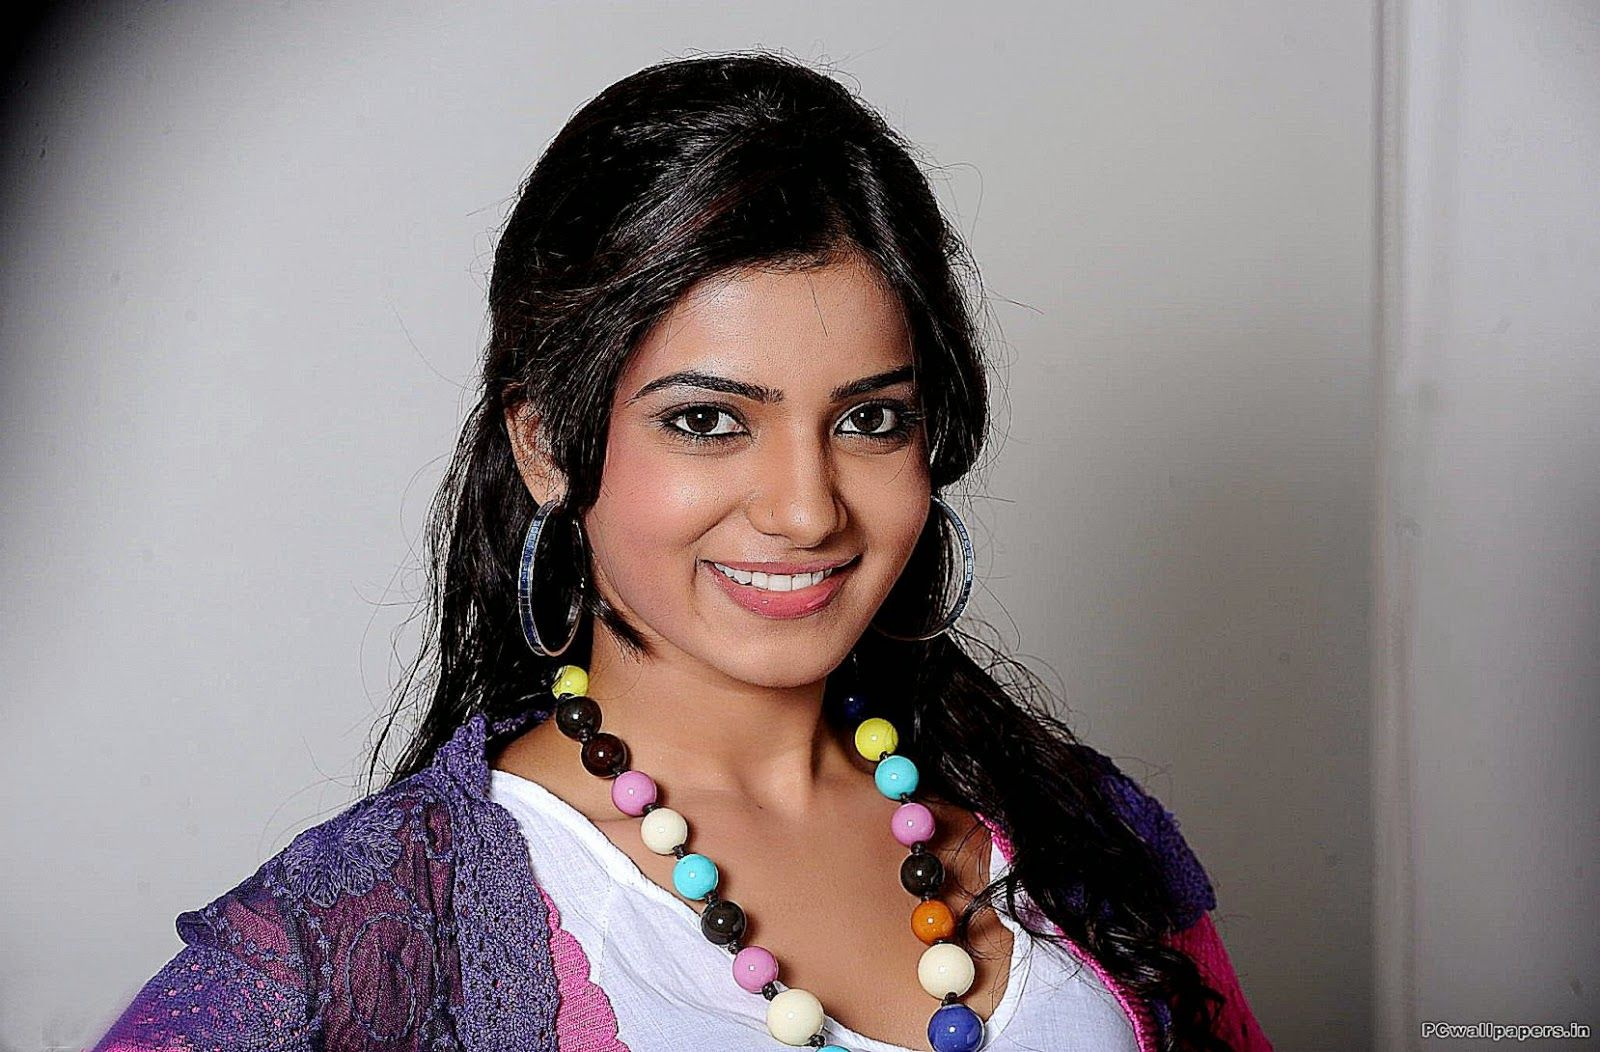 tamil actress hd wallpapers hd wallpapers pinterest tamil